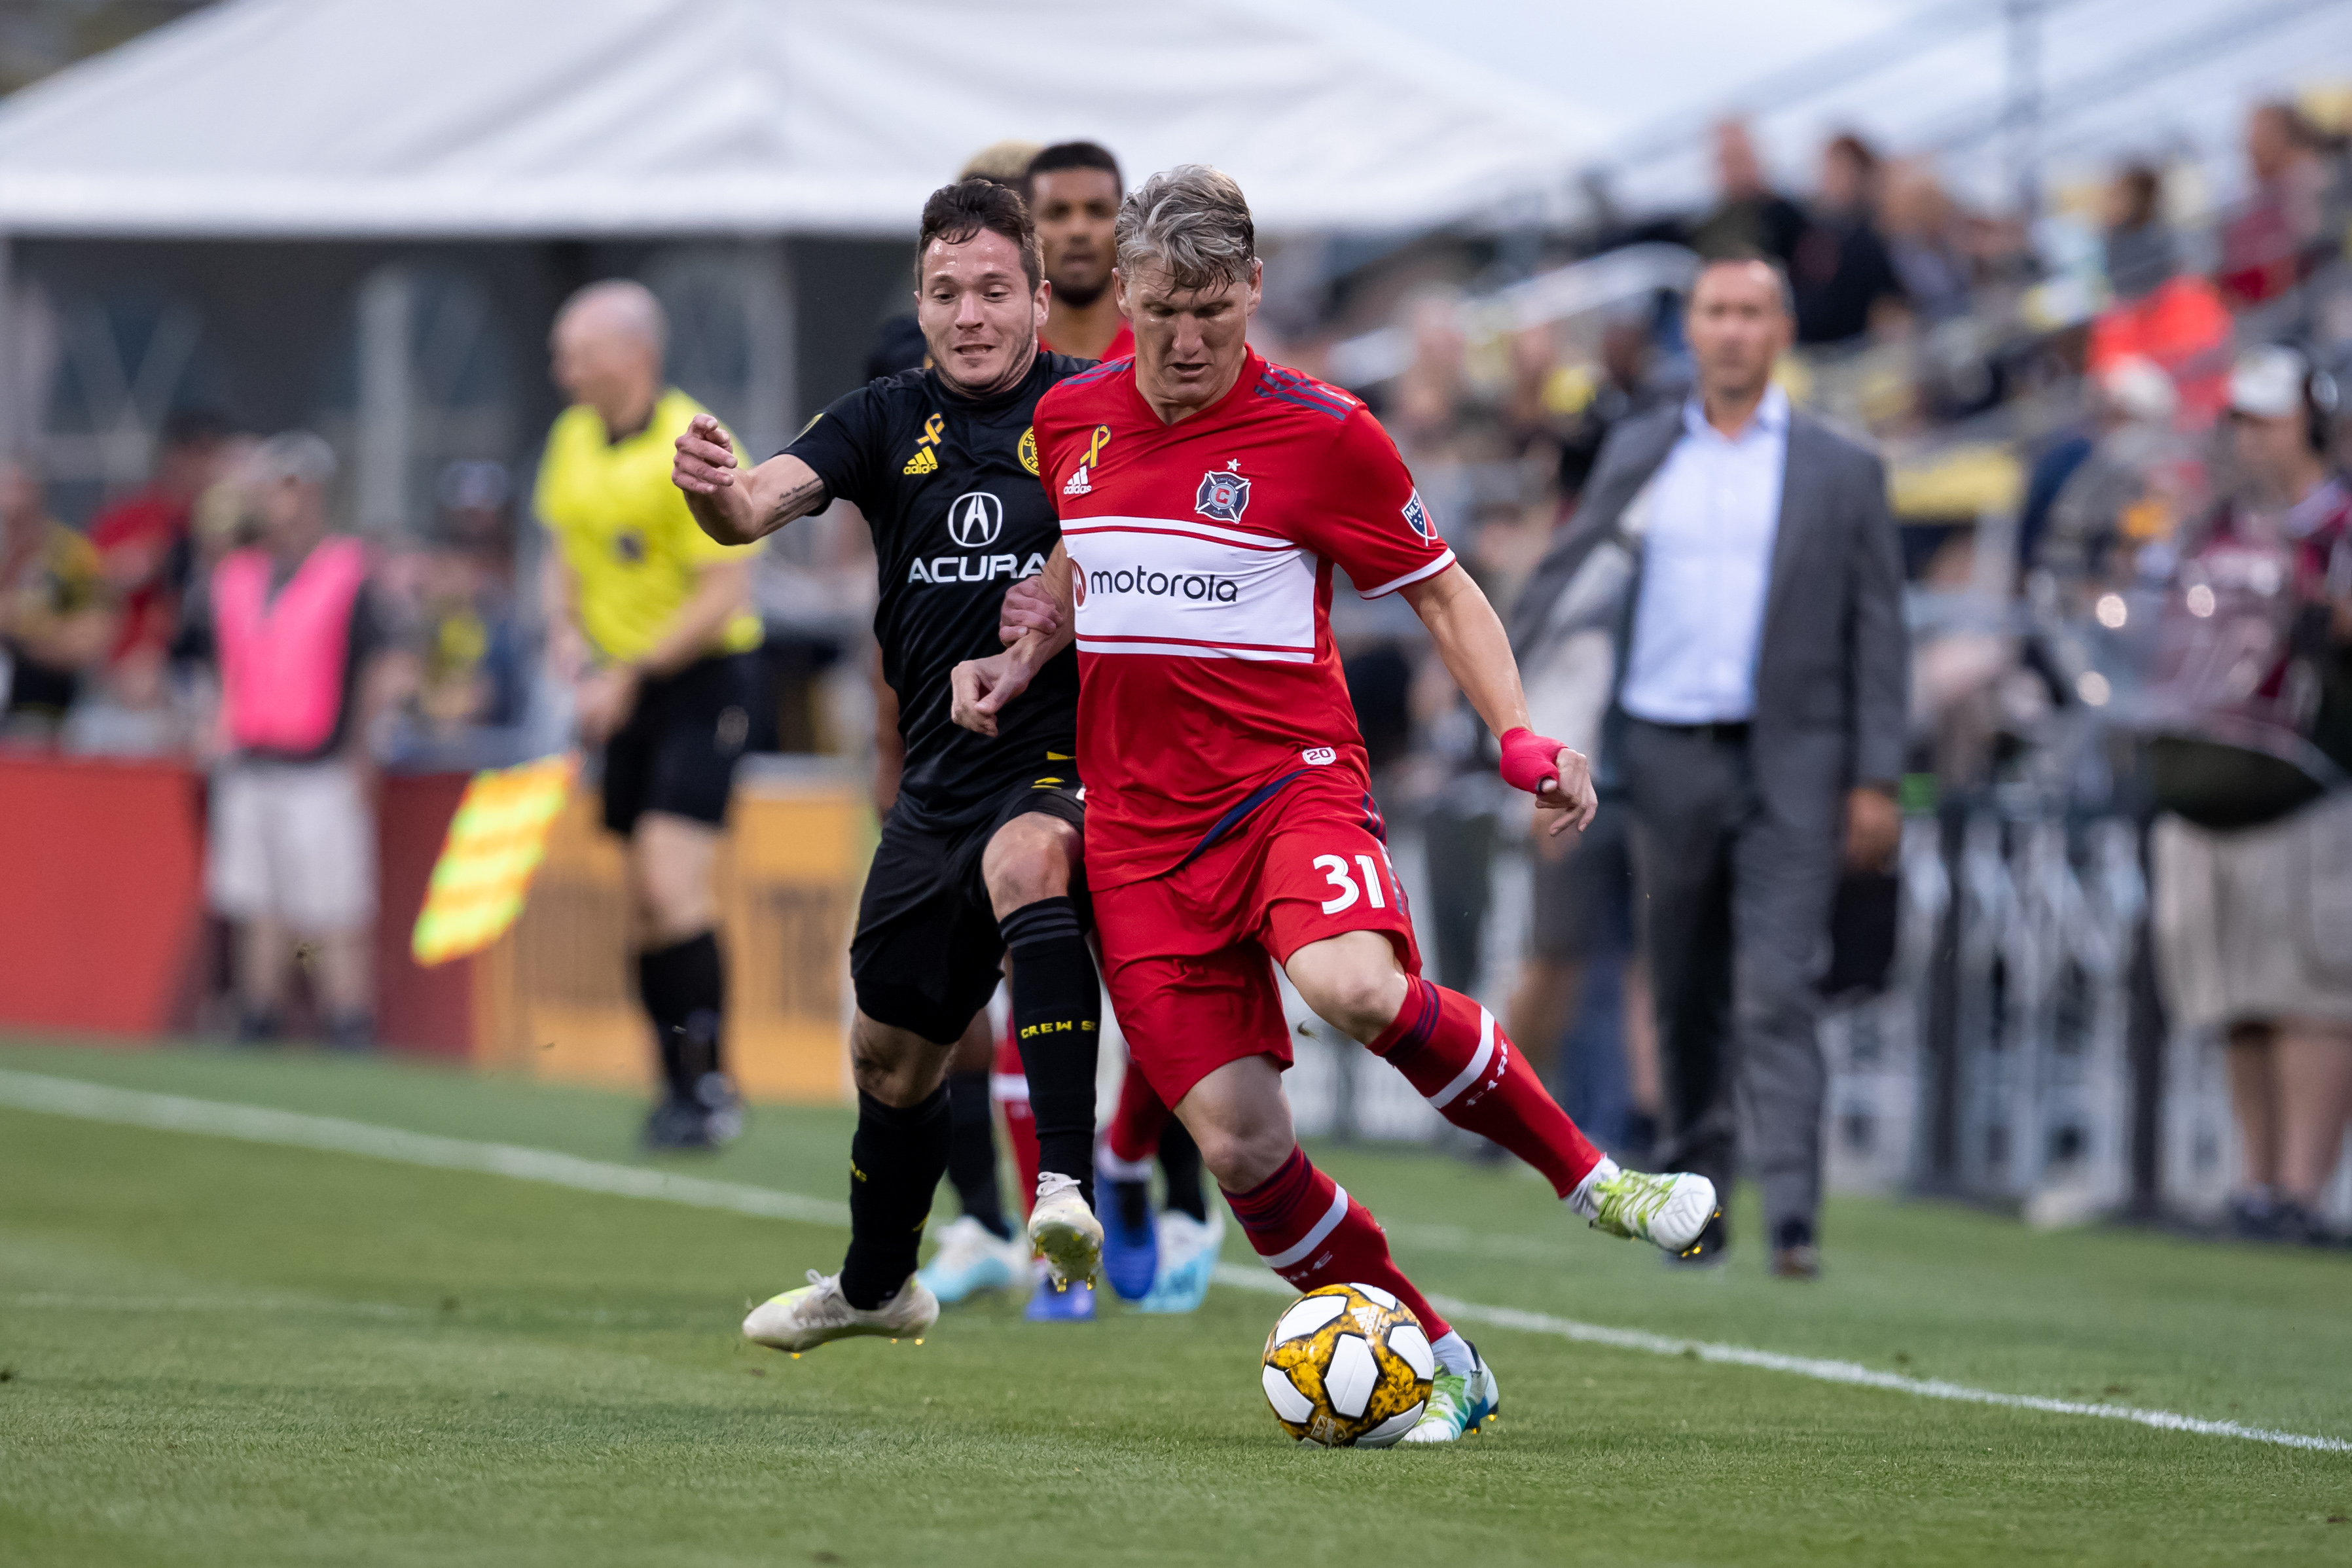 SOCCER: AUG 31 MLS - Chicago Fire at Columbus Crew SC